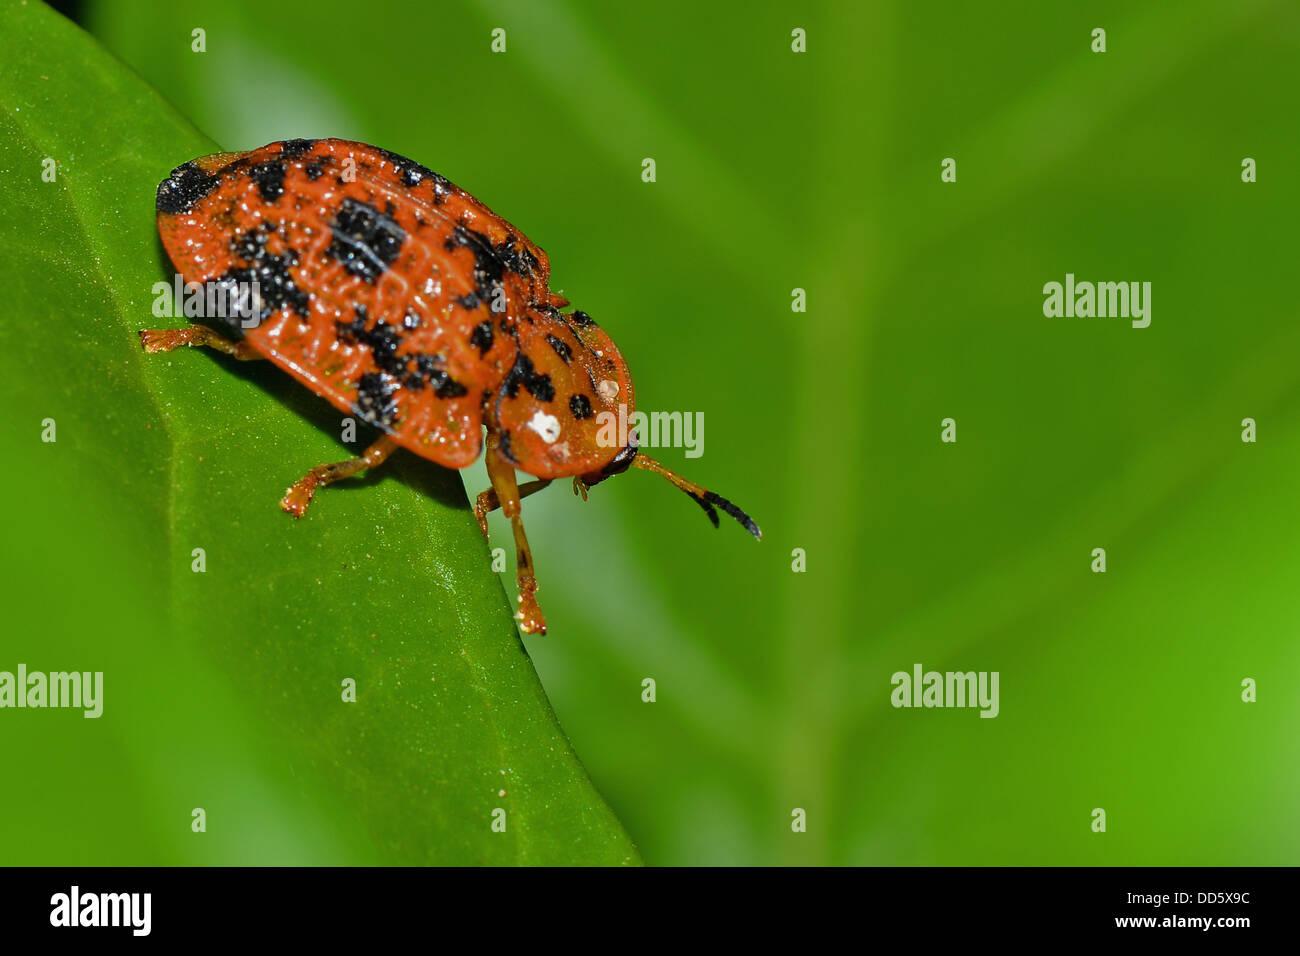 A beetle on a leaf. - Stock Image